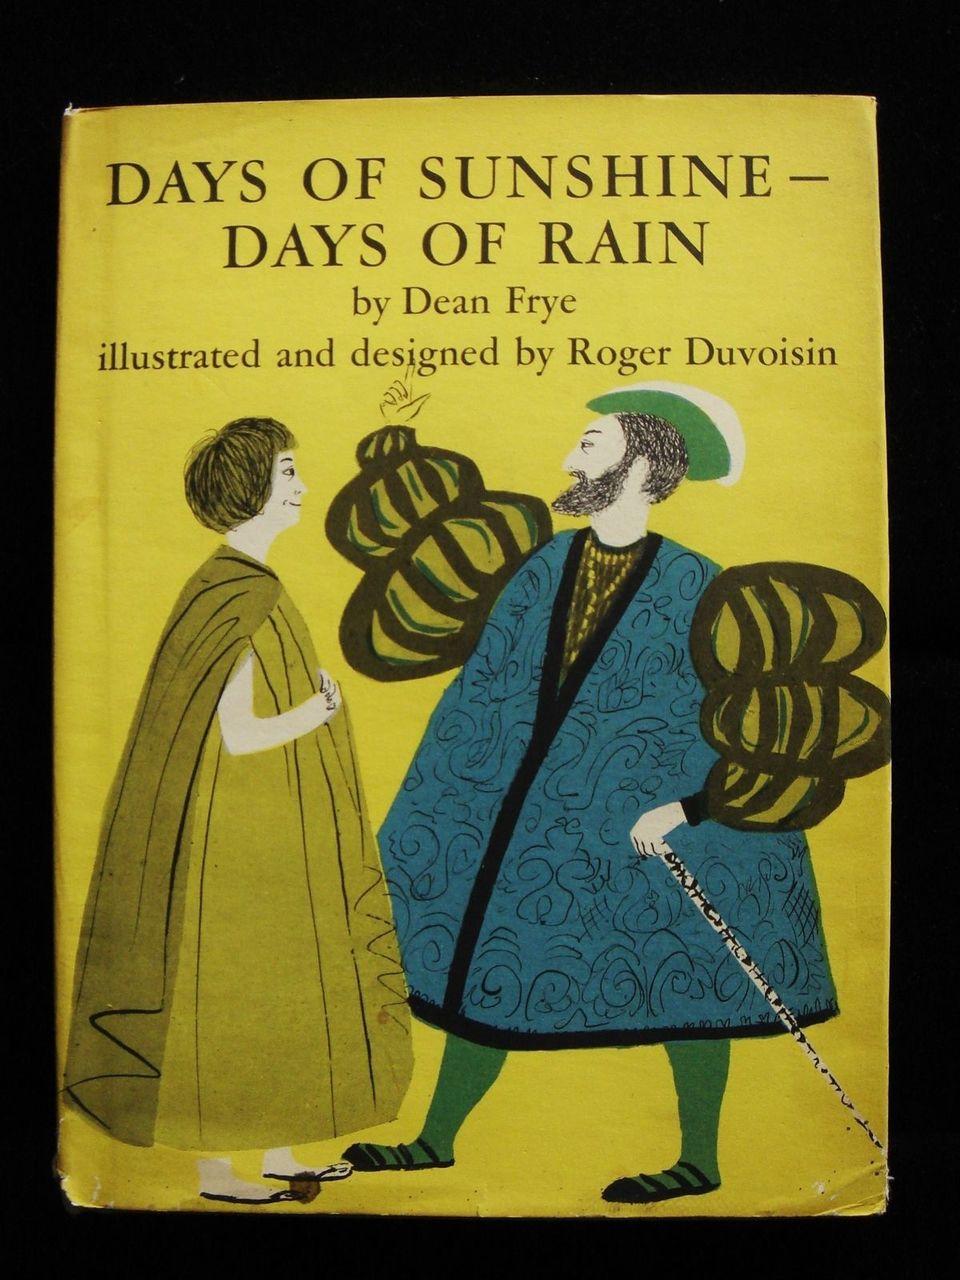 DAYS OF SUNSHINE-DAYS OF RAIN Dean Frye, Roger Duvoisin, John Heywood 16th C